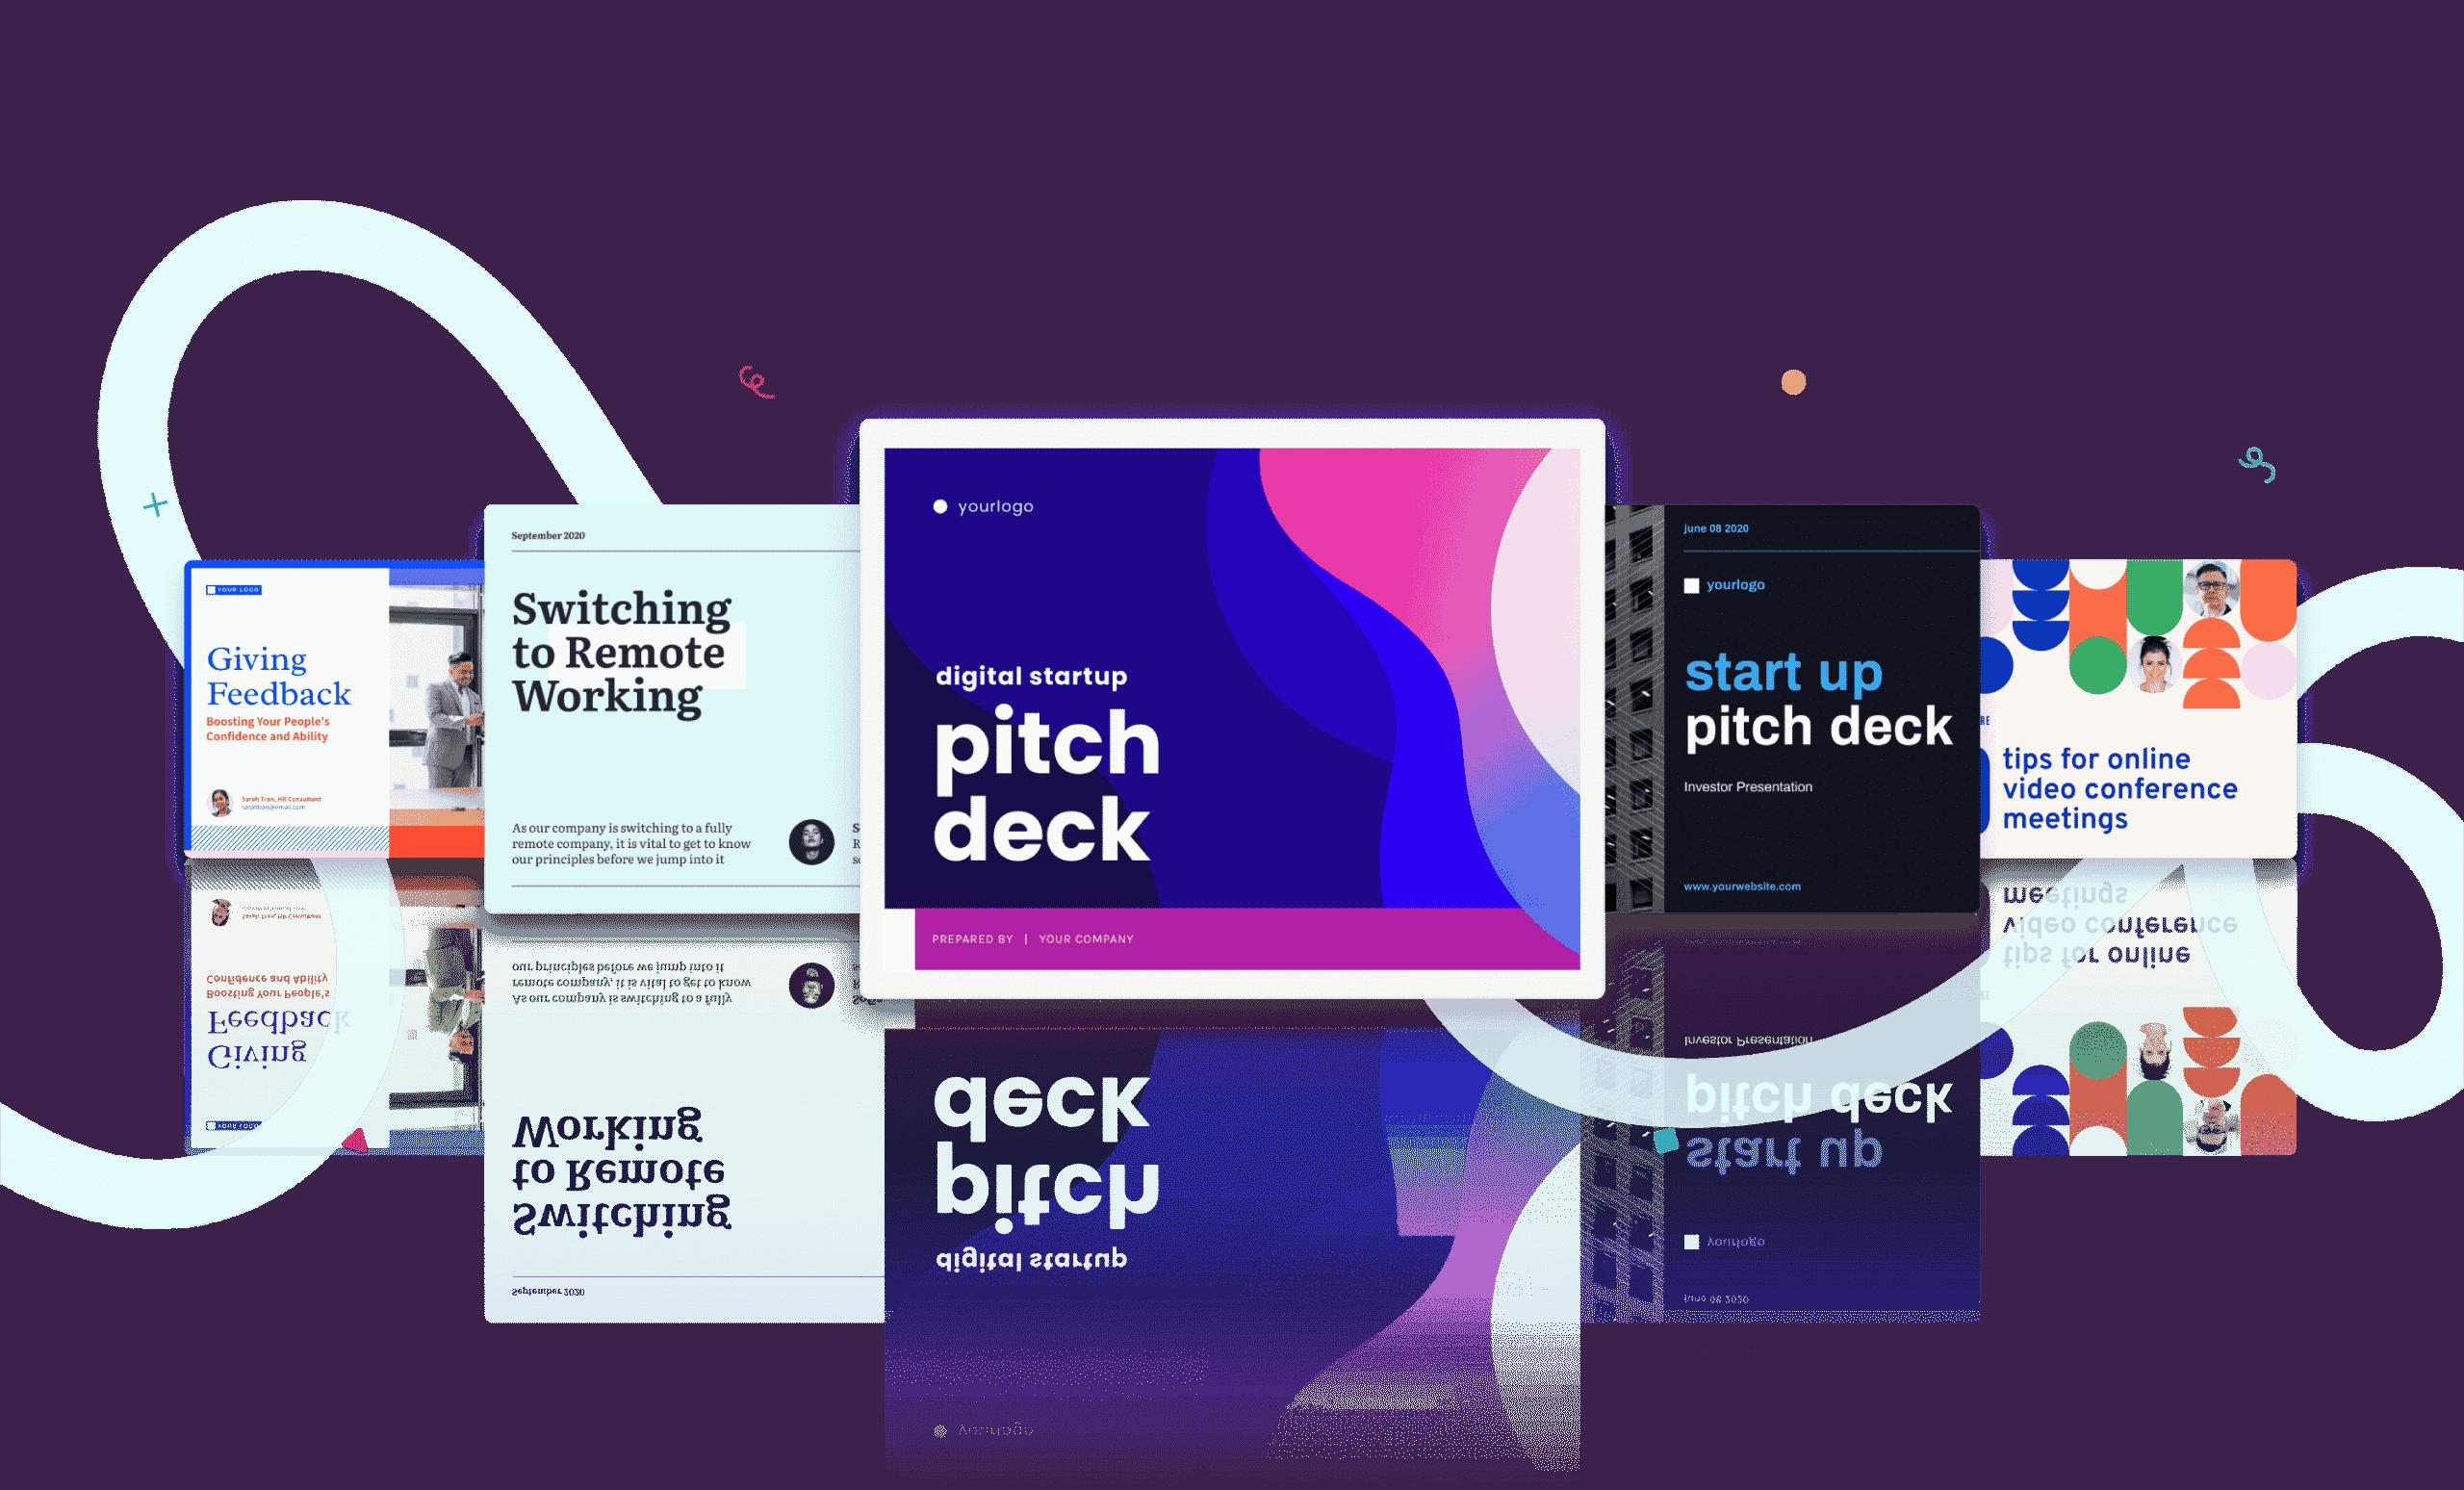 visual content maker, online presentation maker, slideshow online with Piktochart